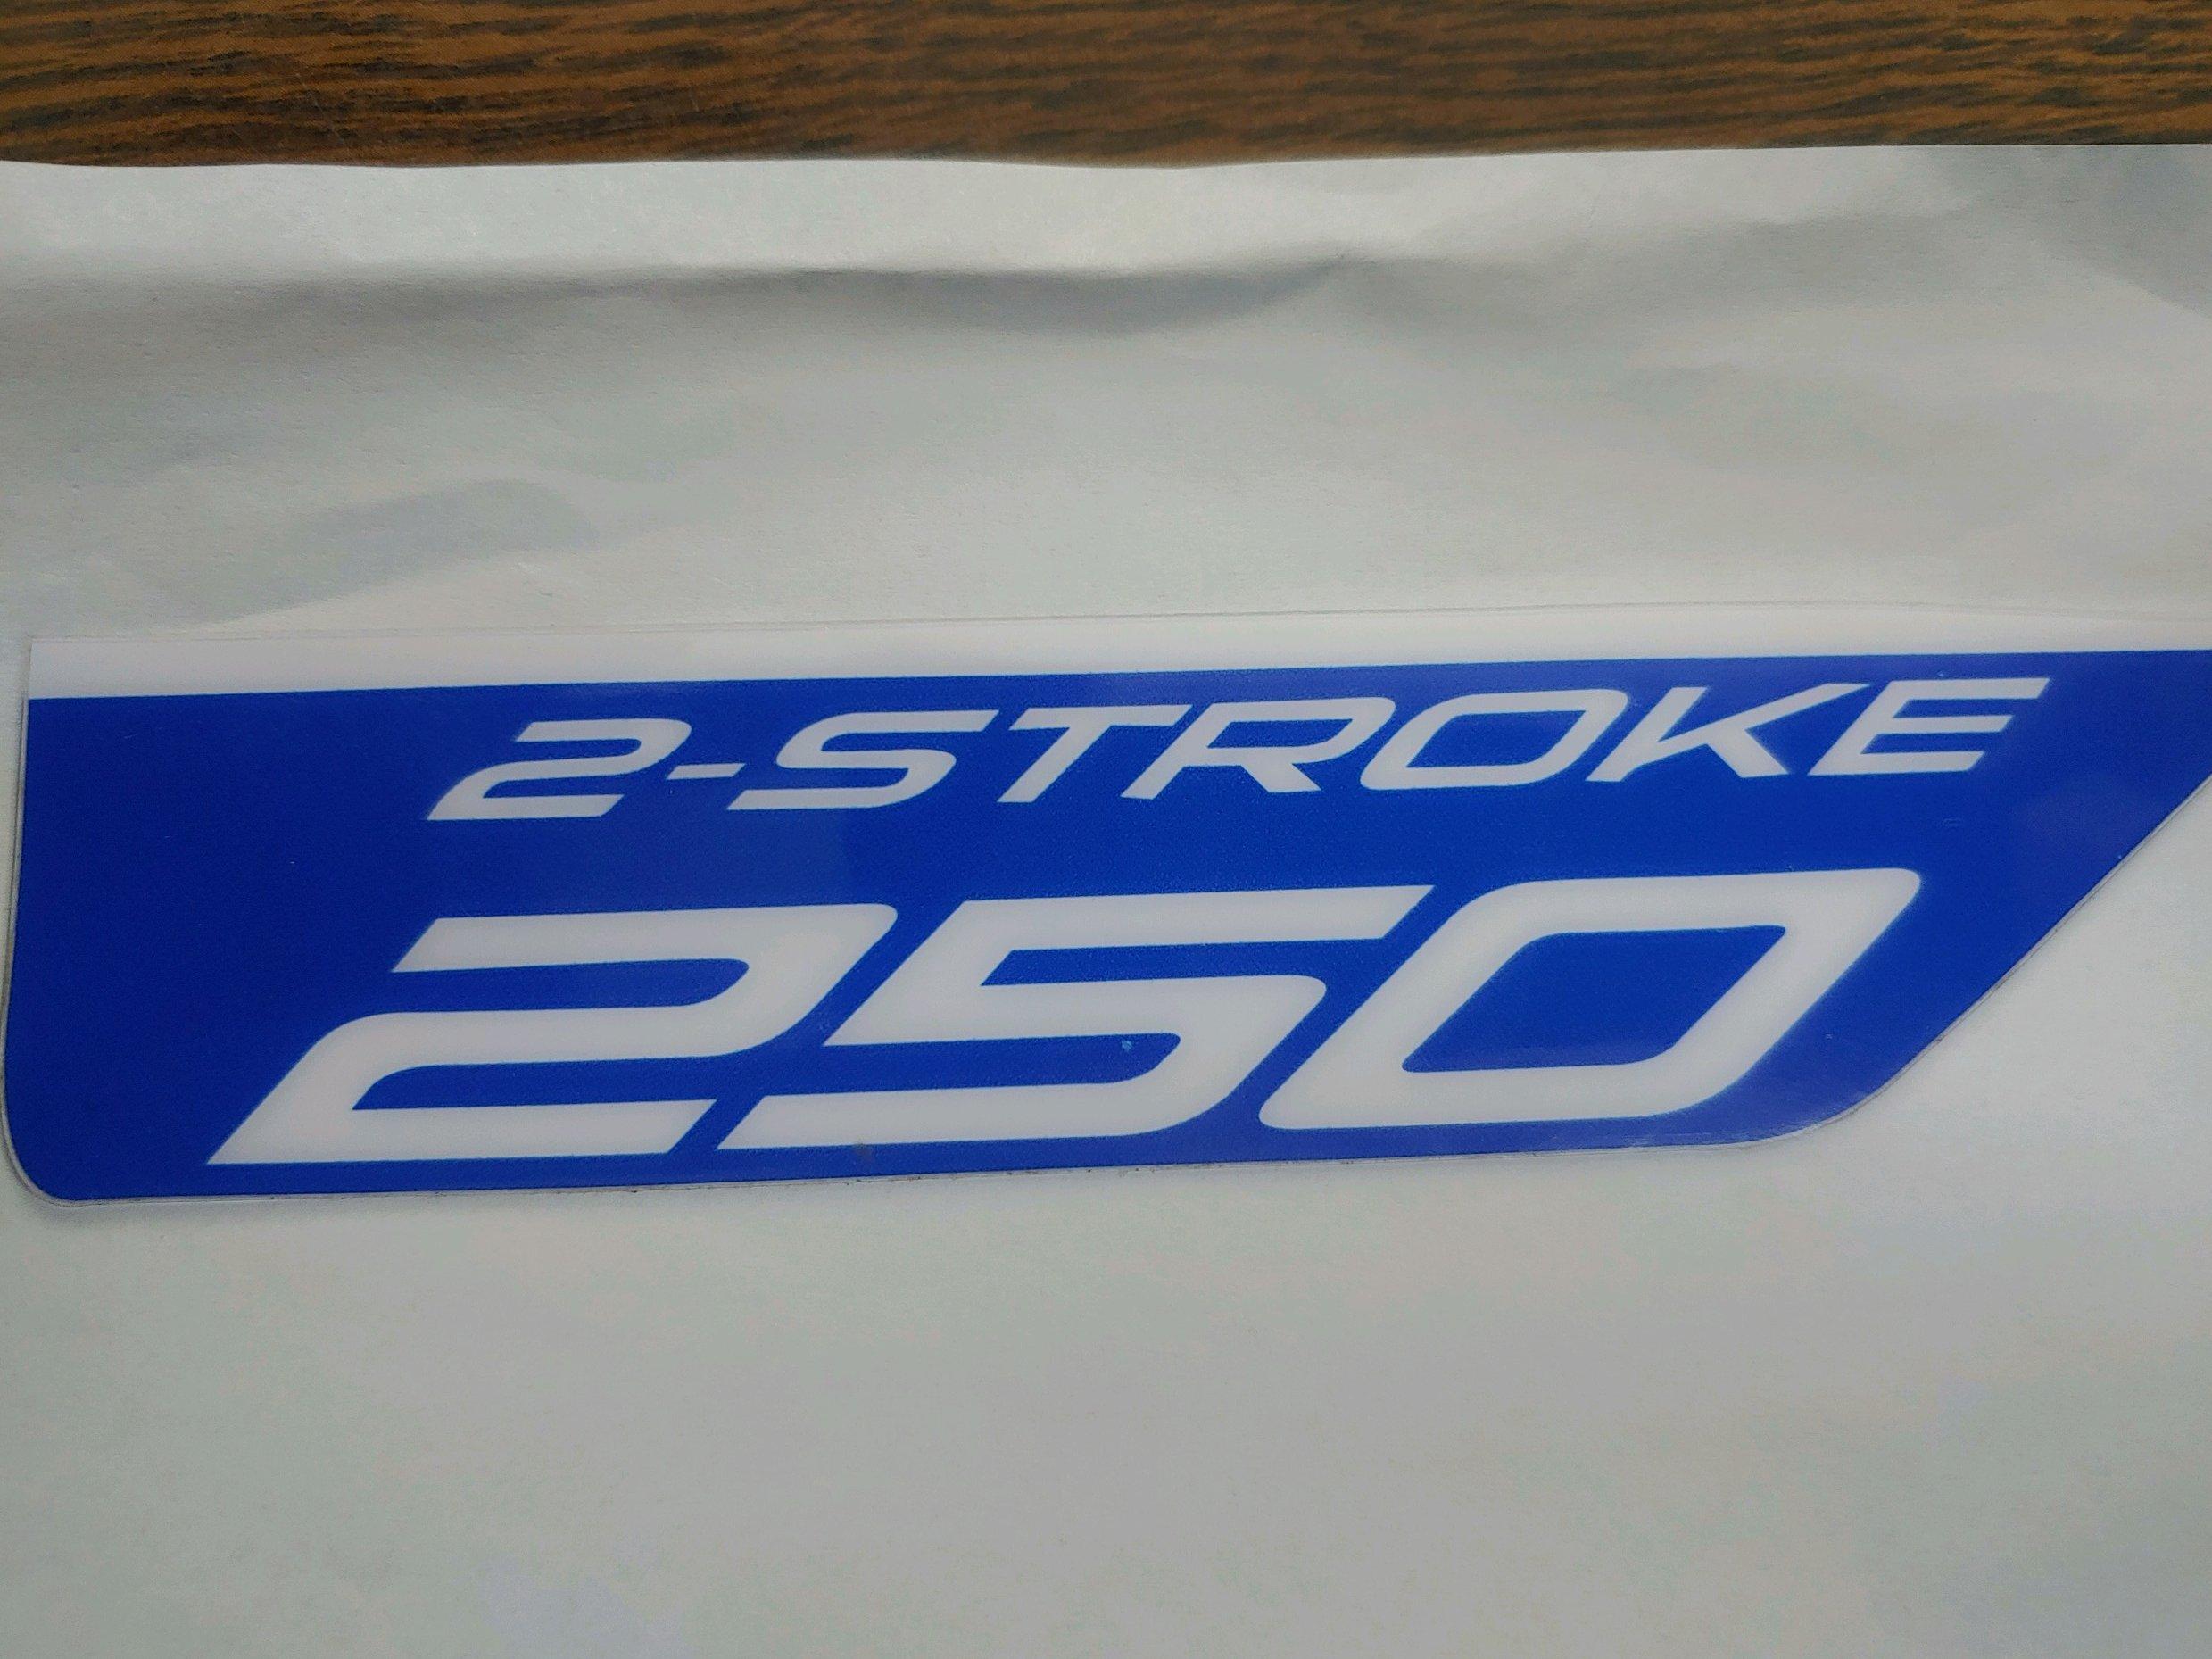 2 stroke.jpg